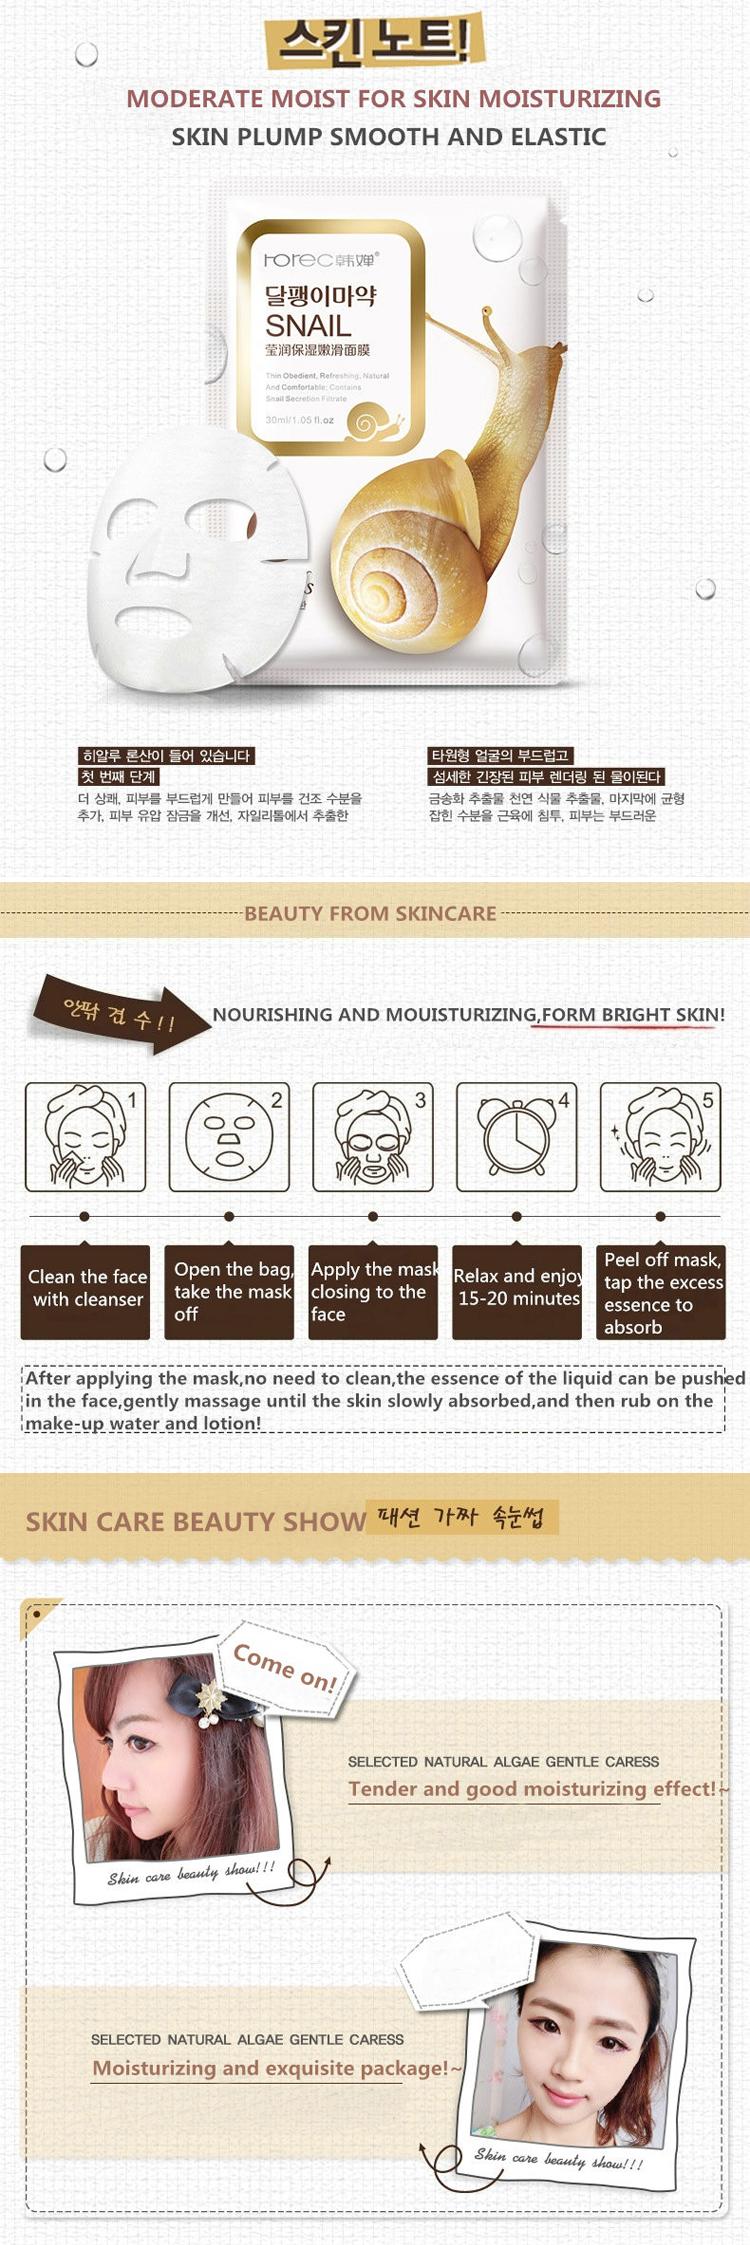 BIOAQUA Sheet Mask 10pcs Snail Essence Facial Mask Skin Care Face Mask Whitening Hydrating Moisturizing Mask Lot Factory Price 3